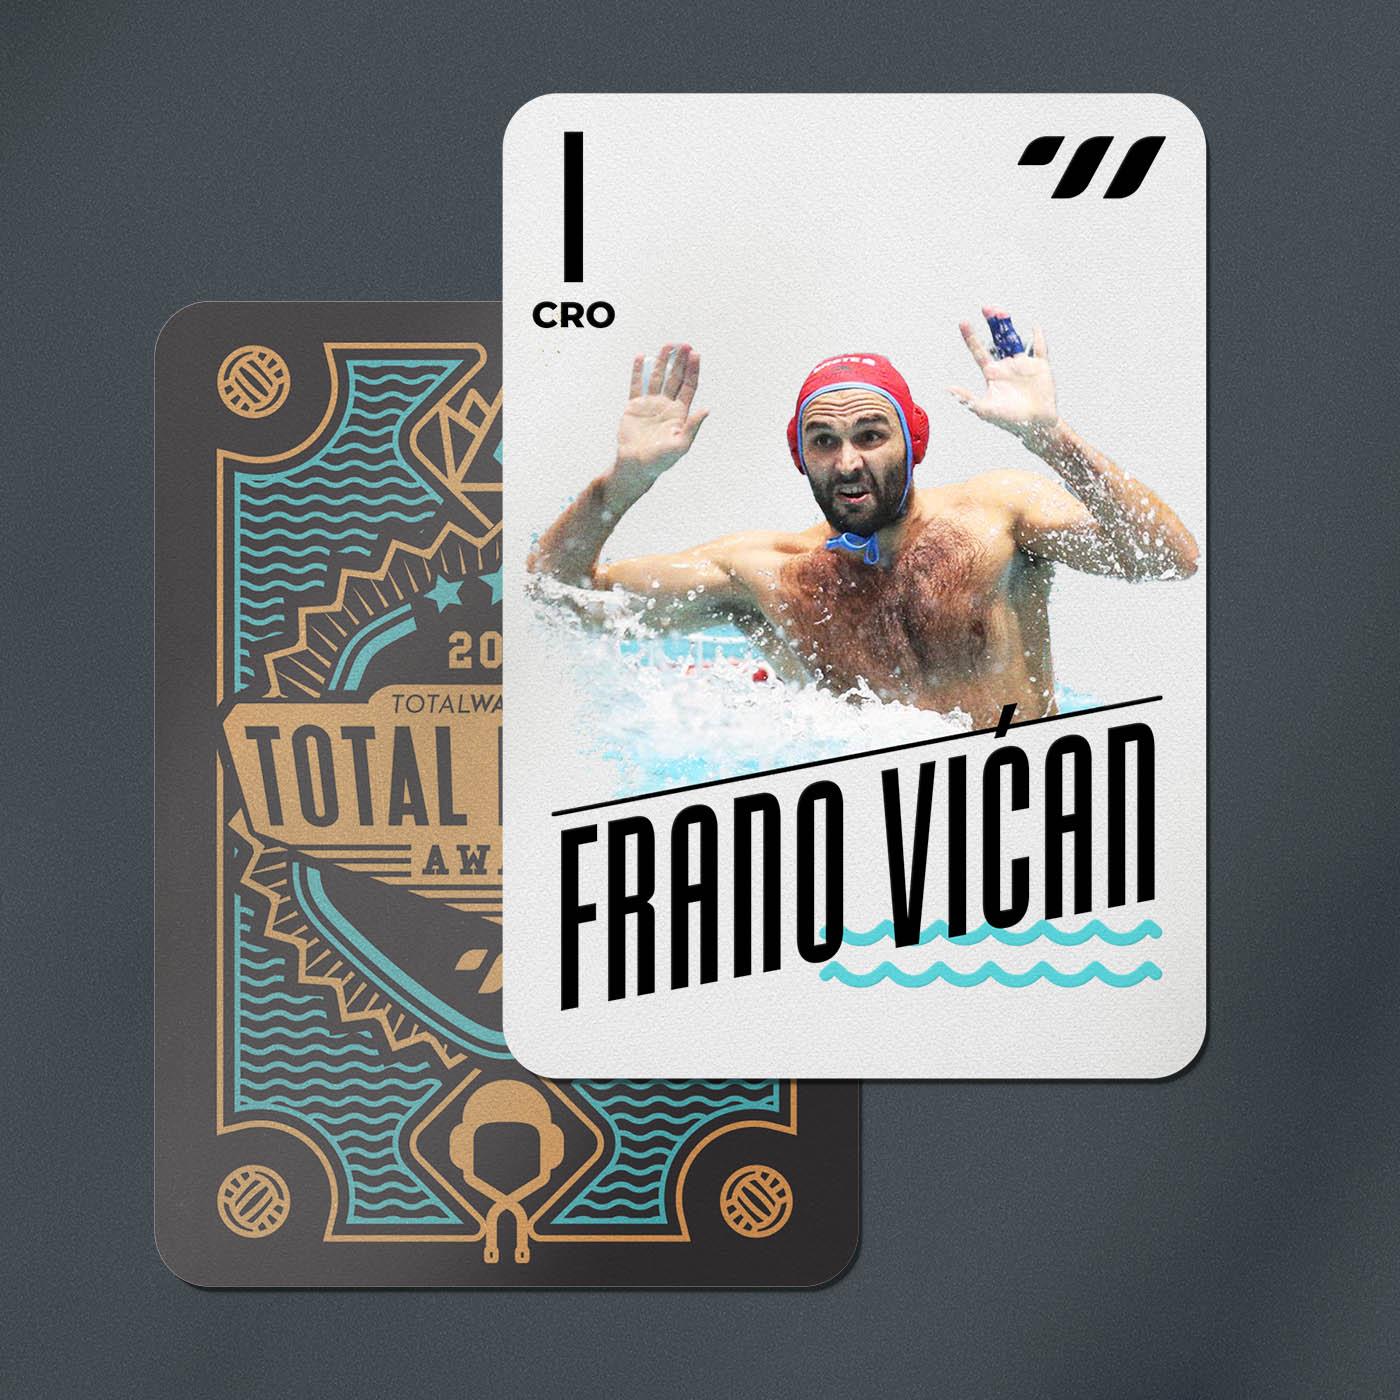 GOALKEEPER - Frano Vican (CRO)